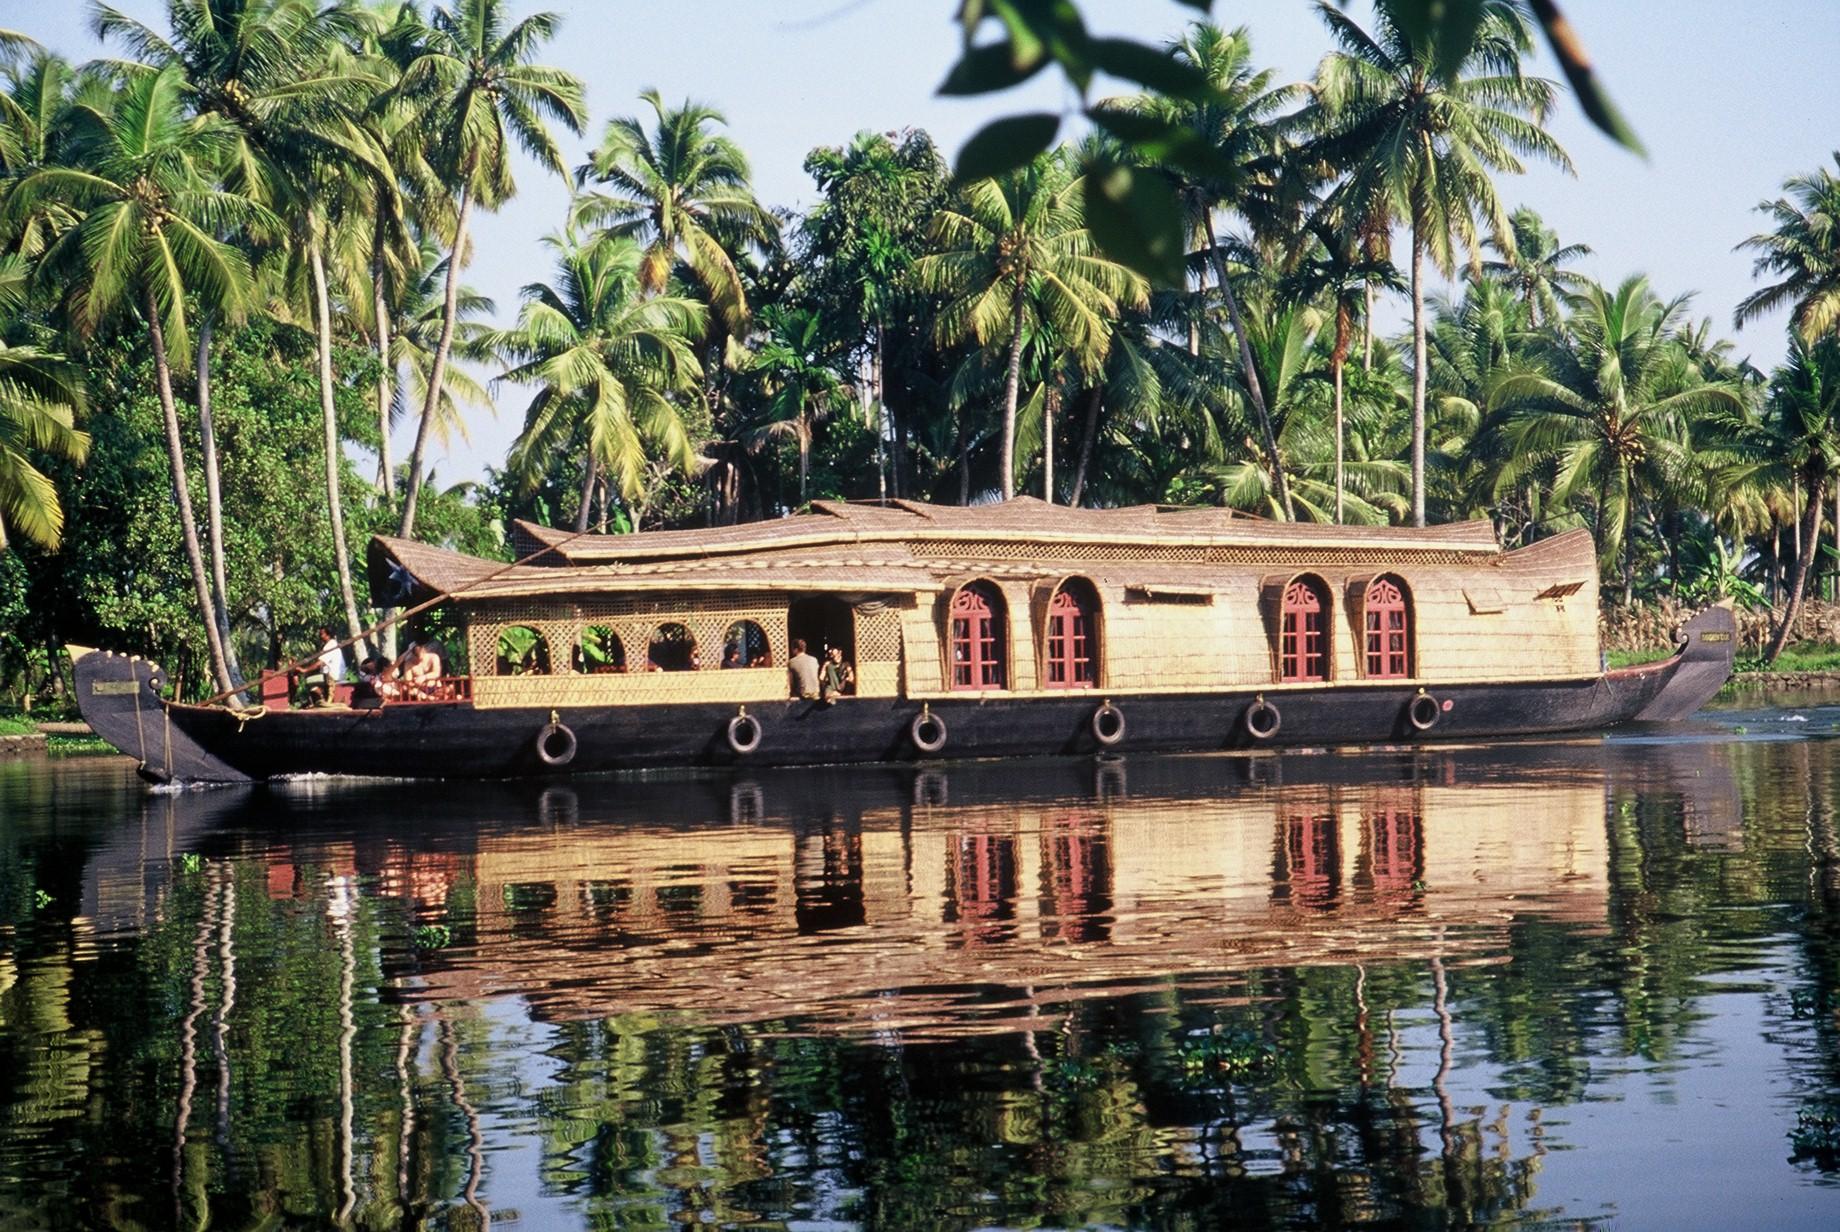 india-kerala-houseboat-backwaters-wadi-destination.JPG